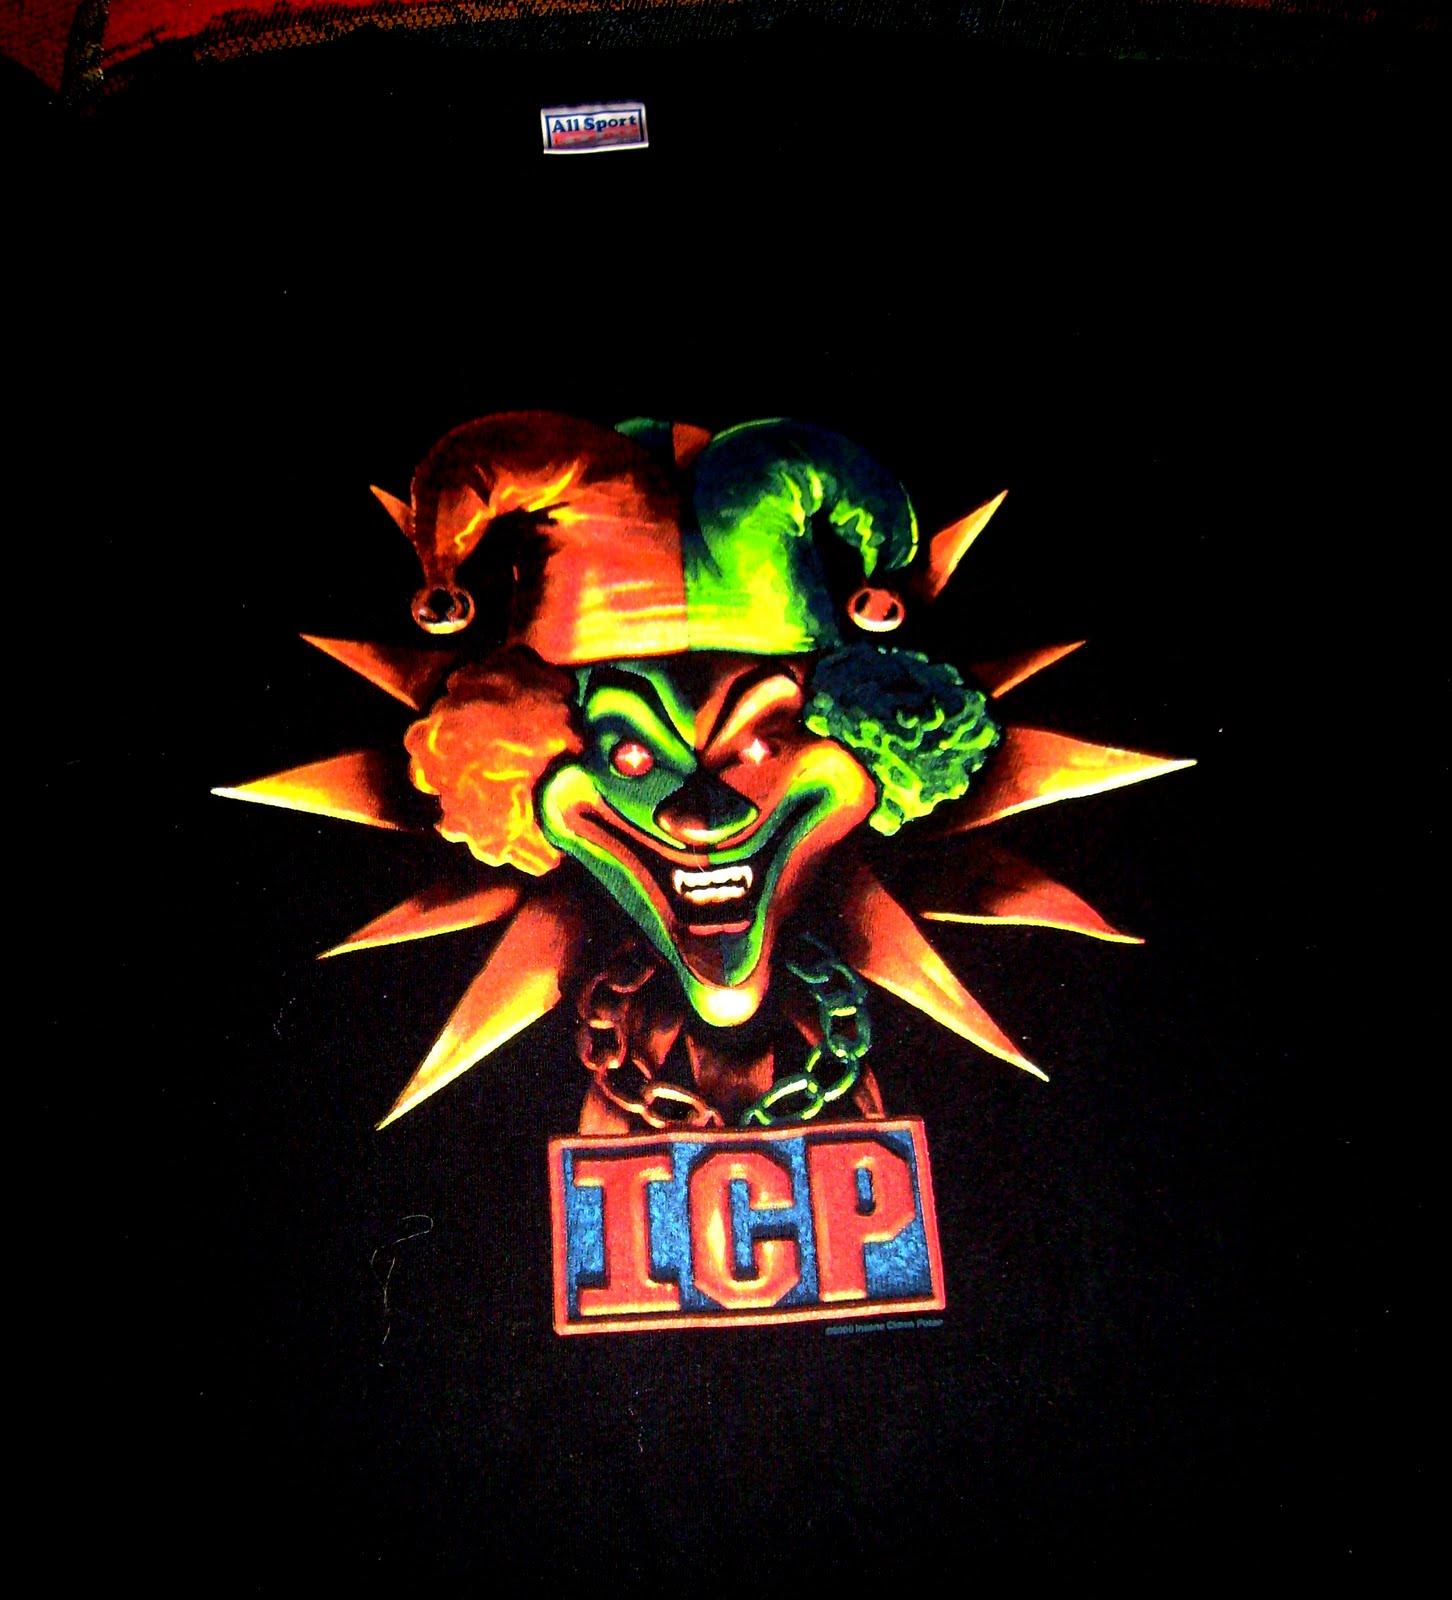 Icp Wallpaper: ICP Wallpaper Juggalo